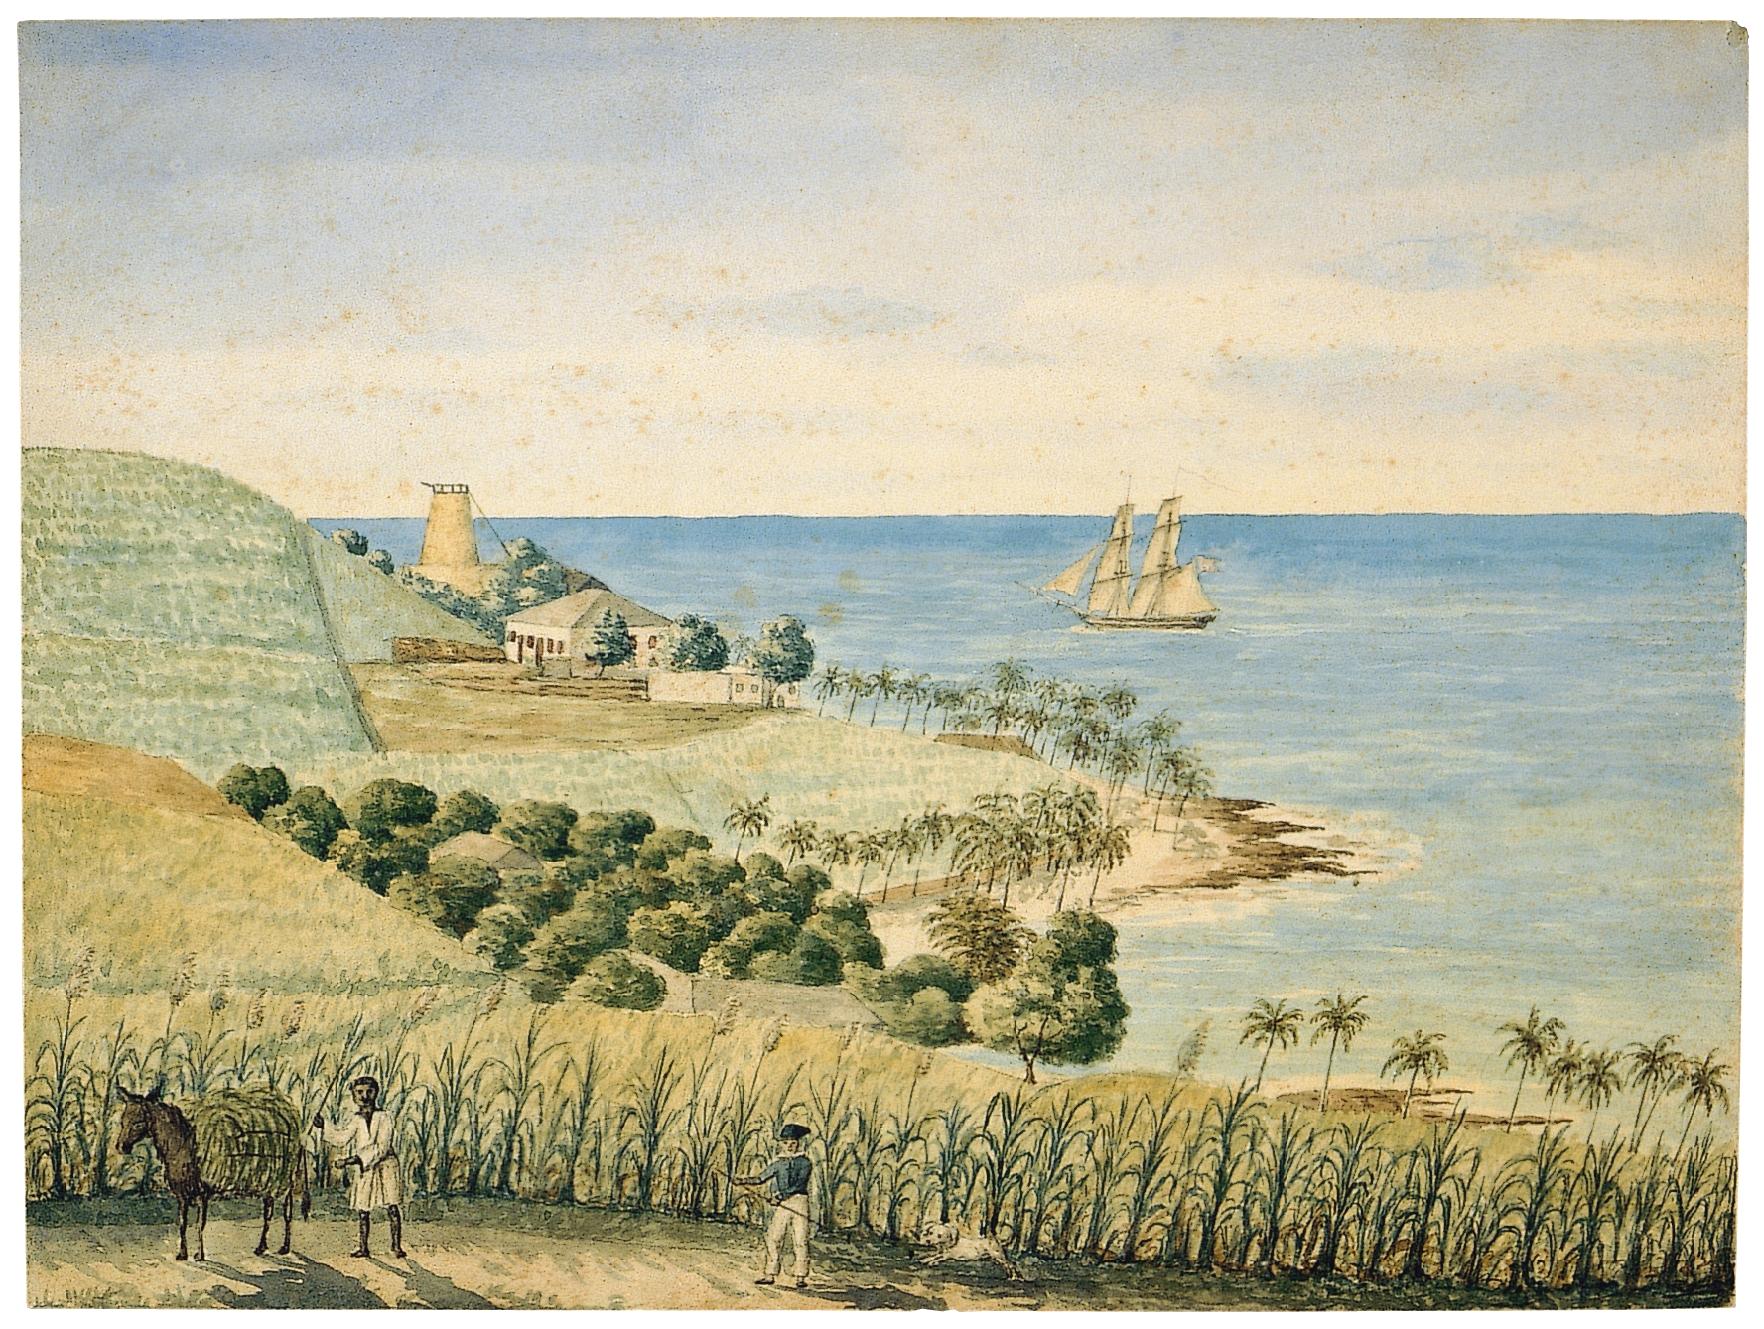 Butlersbay på St. Croix F. Scholten november 1833. Nationalmuseet.